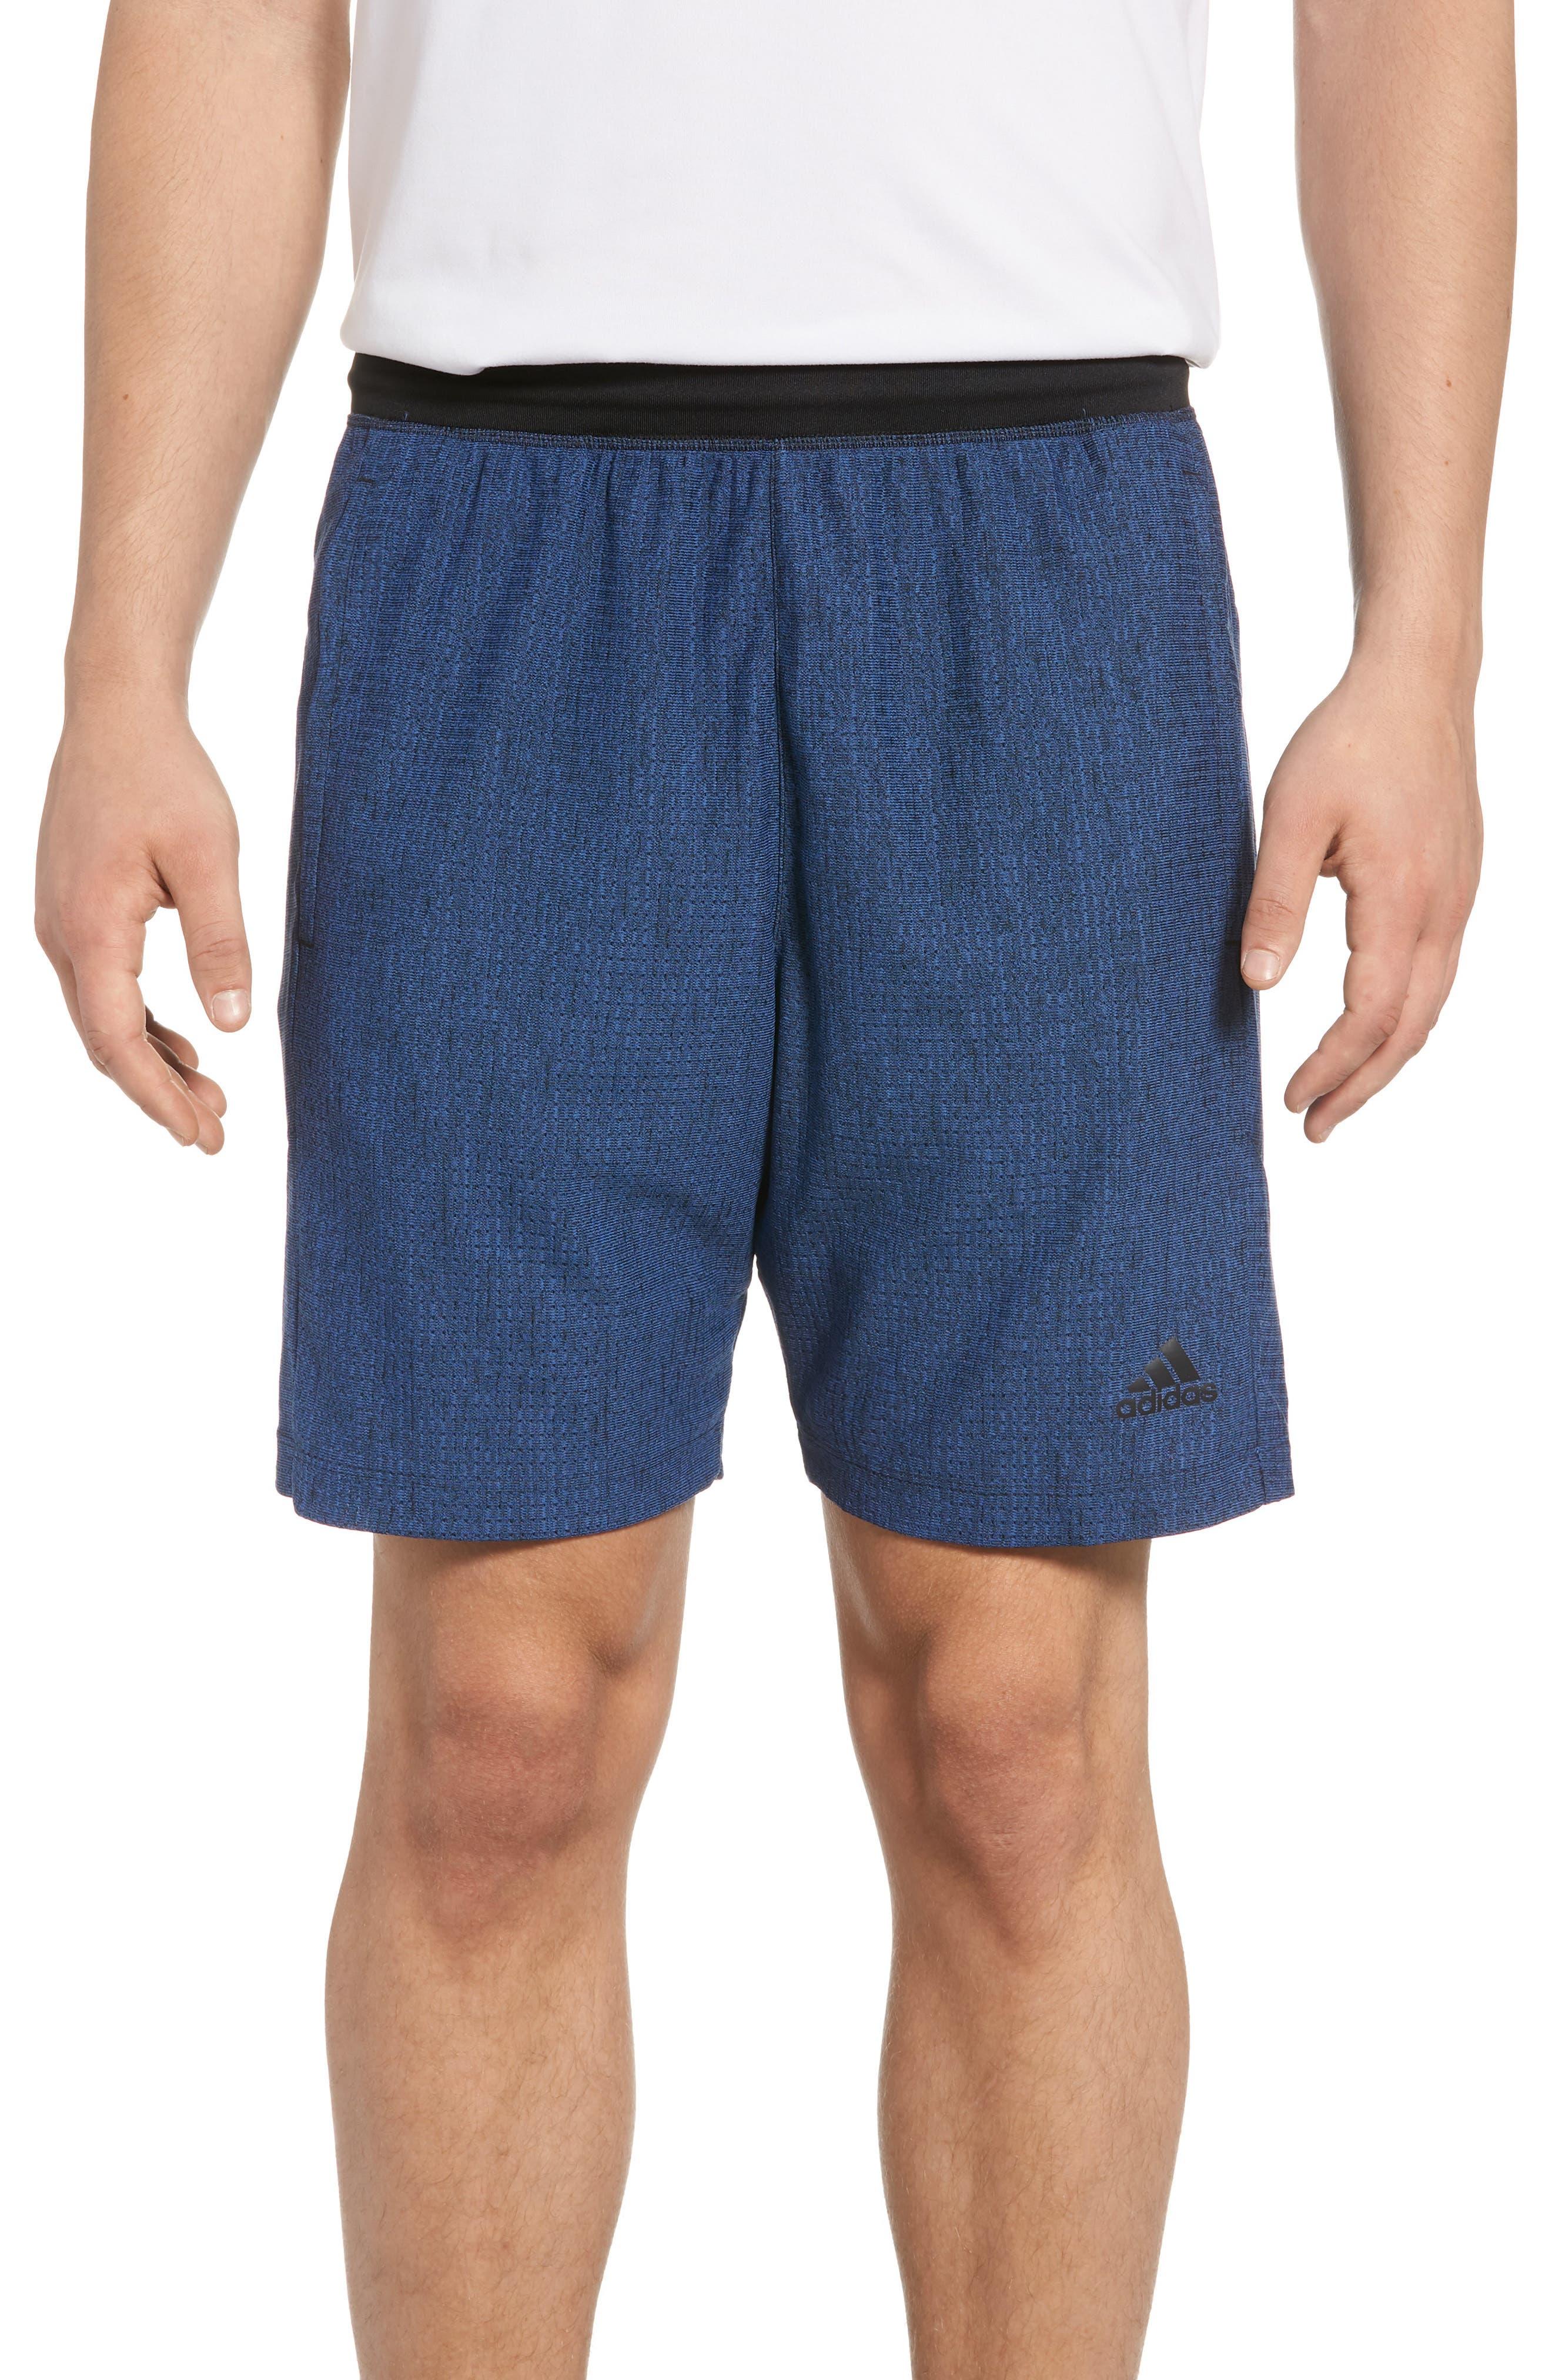 Speedbreaker Shorts,                         Main,                         color, Hi-Res Blue